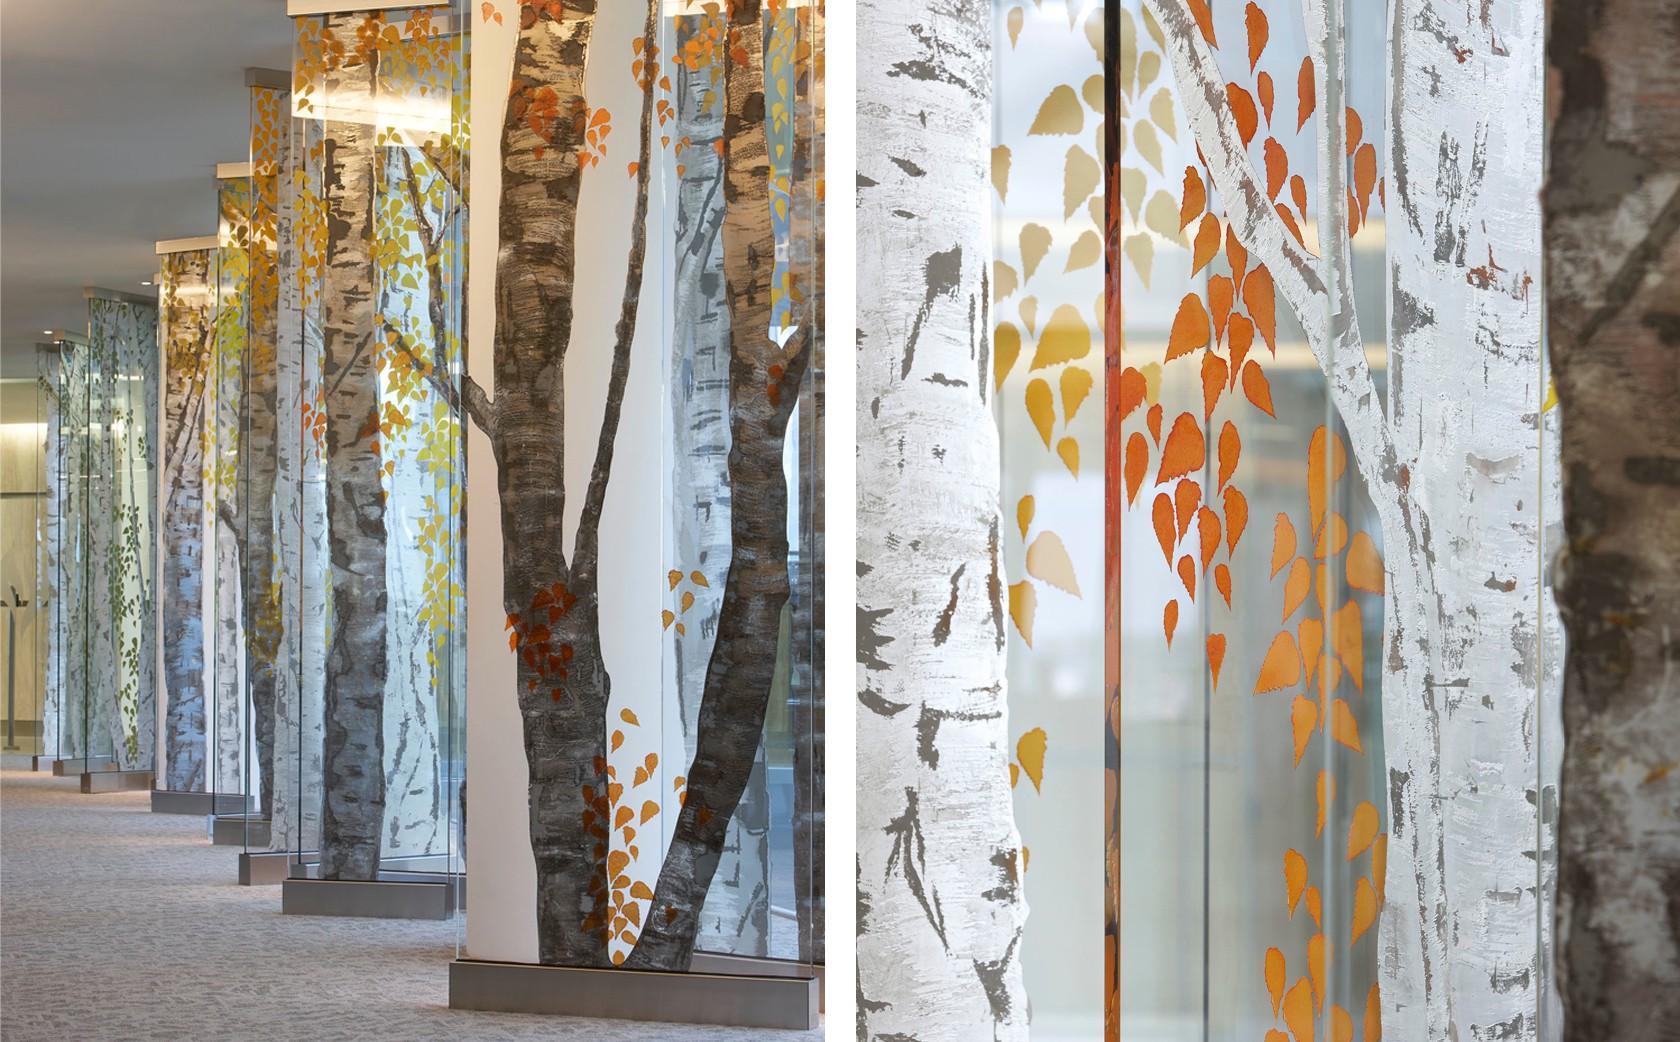 Architectural Glass Sculpture Birch Tree Walk - Autumn to Winter Seasons